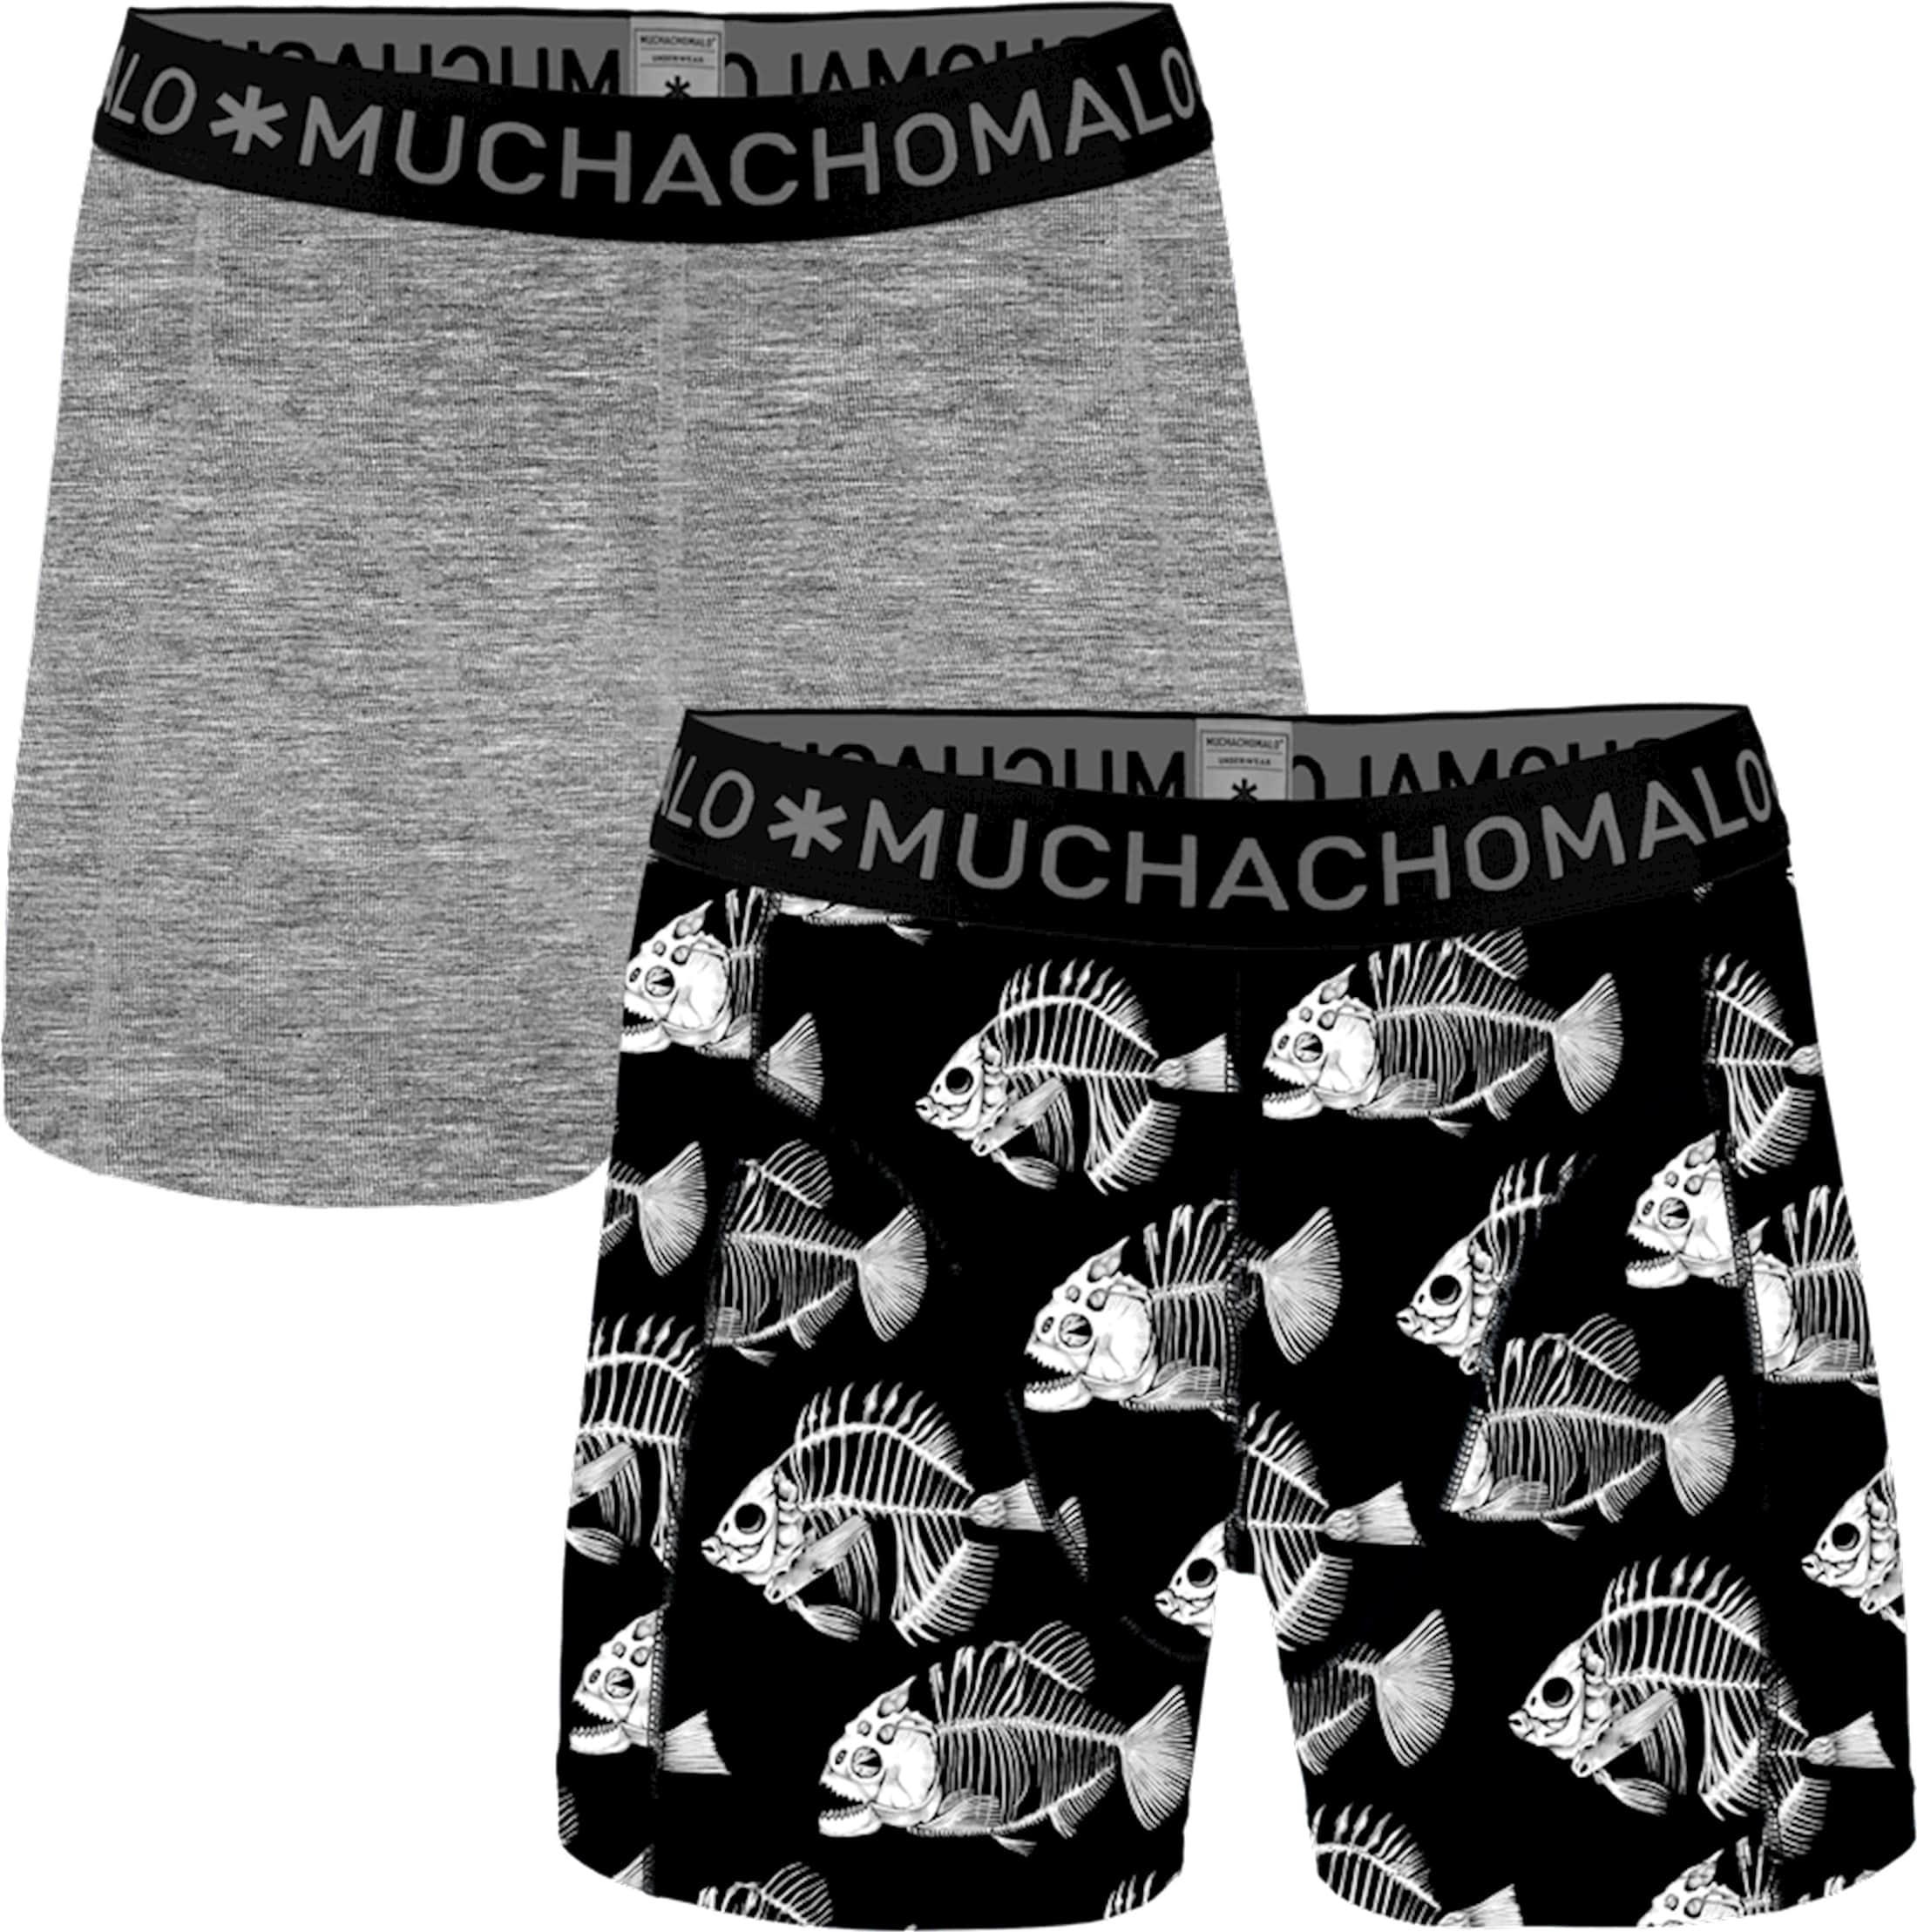 Muchachomalo Boxershorts 2-Pack Fish 7 foto 0